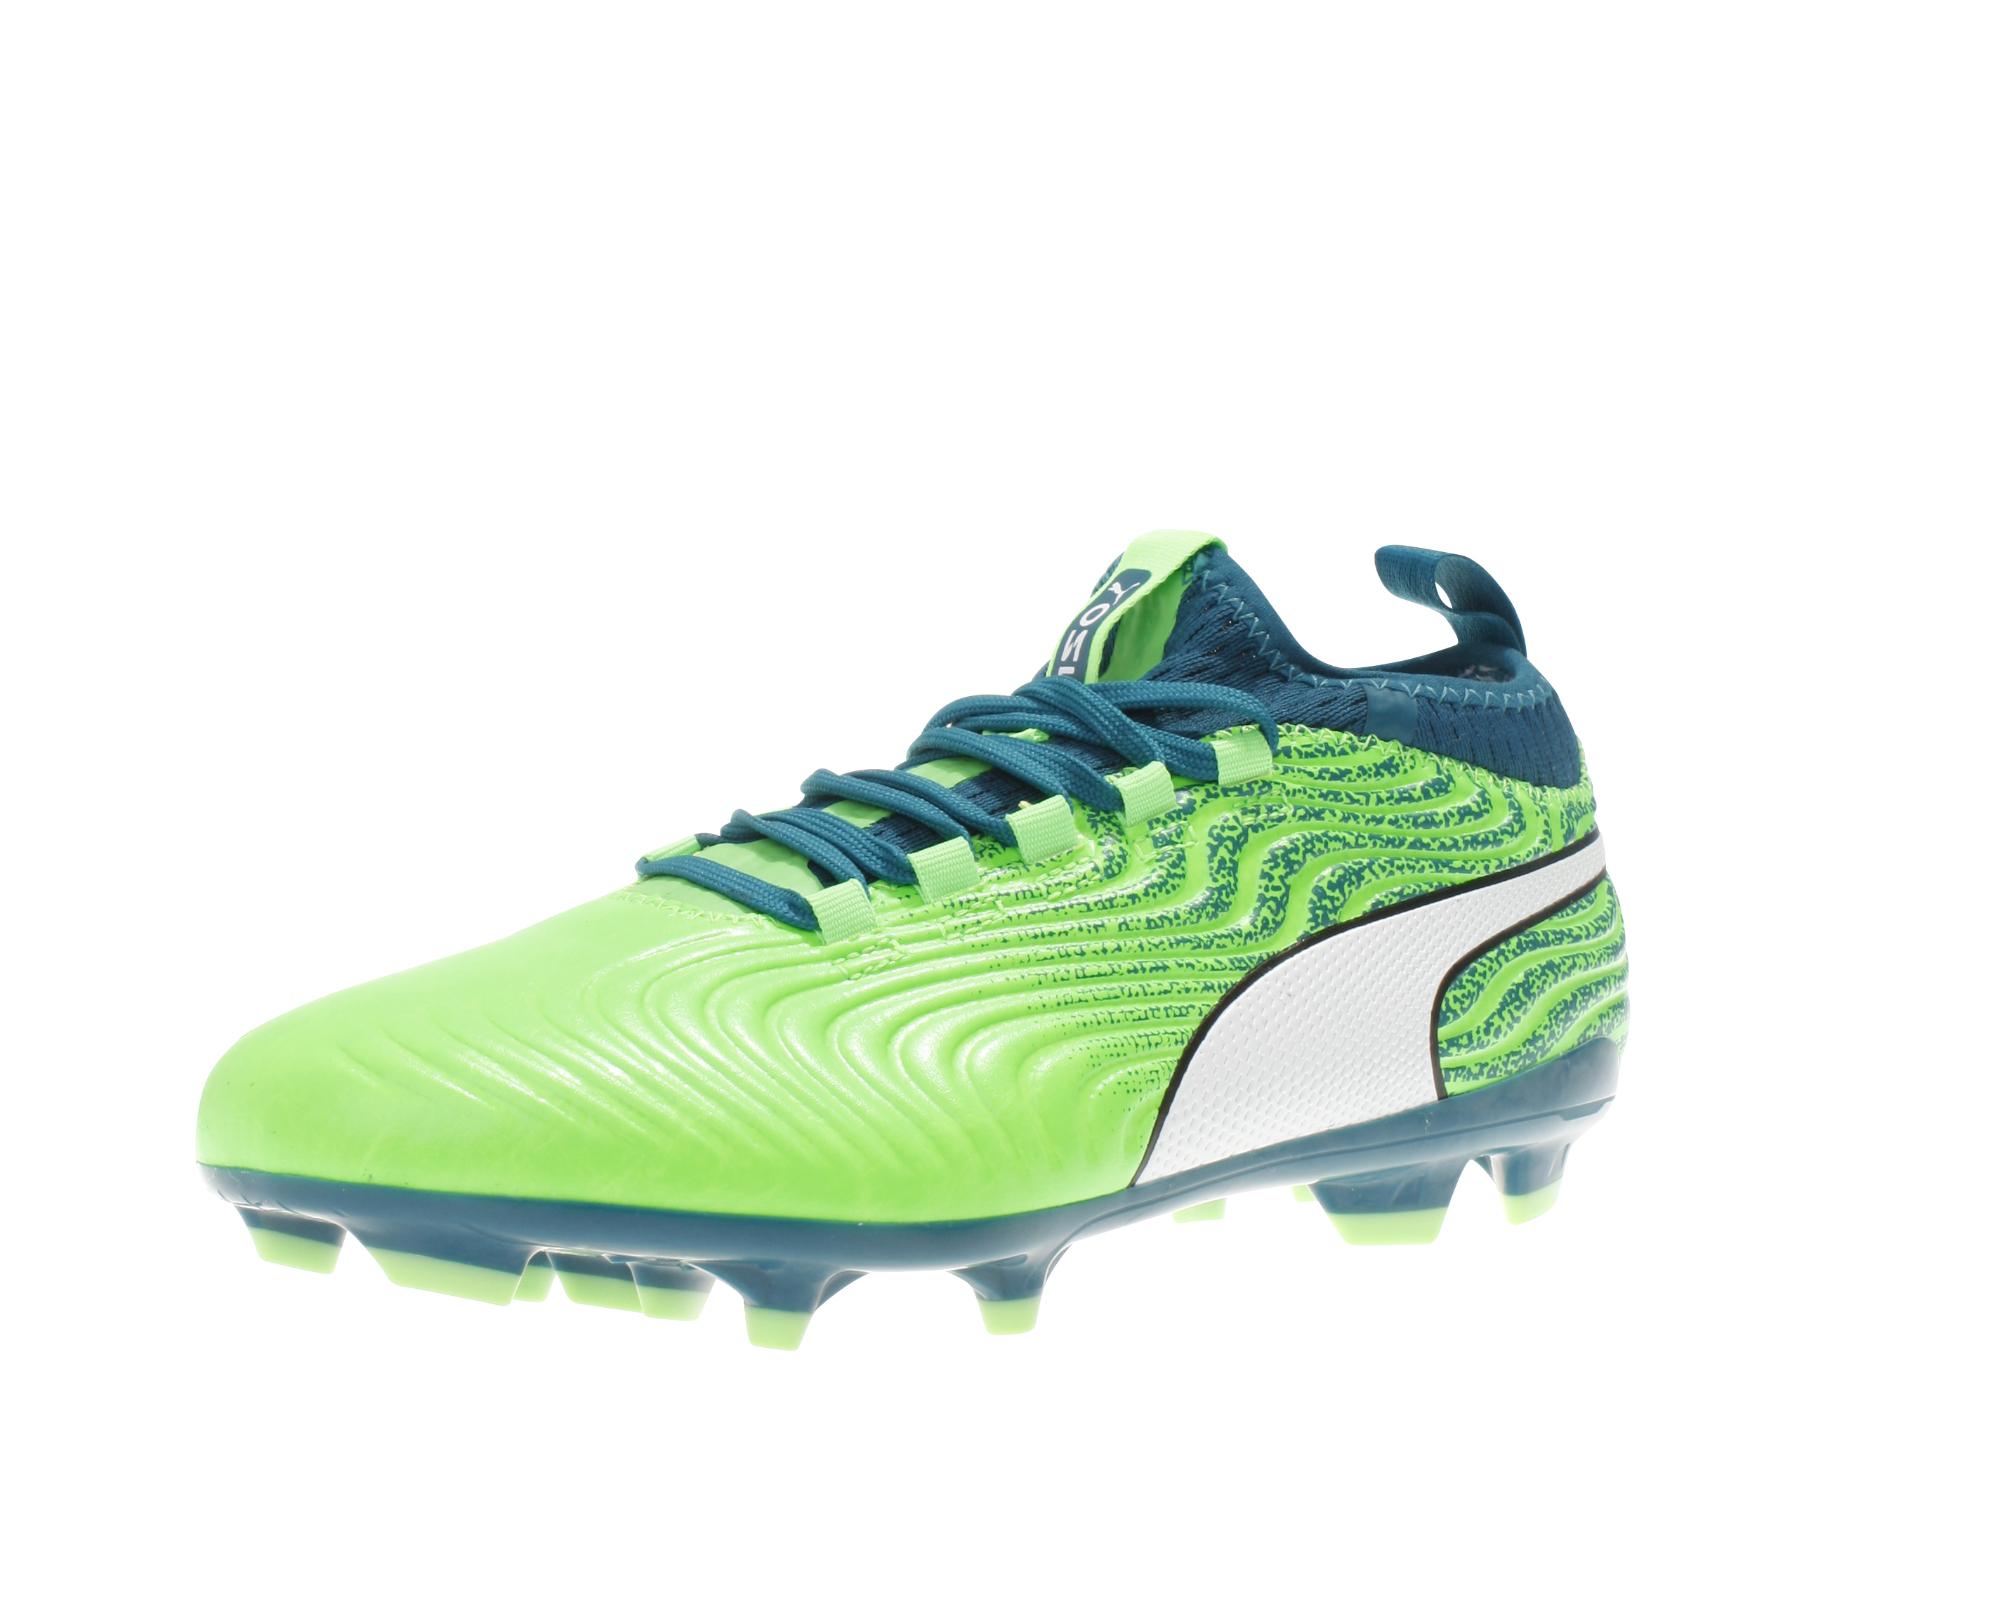 Puma Herren Fußball Schuhe Puma One 18.3 Syn FG 104870 03